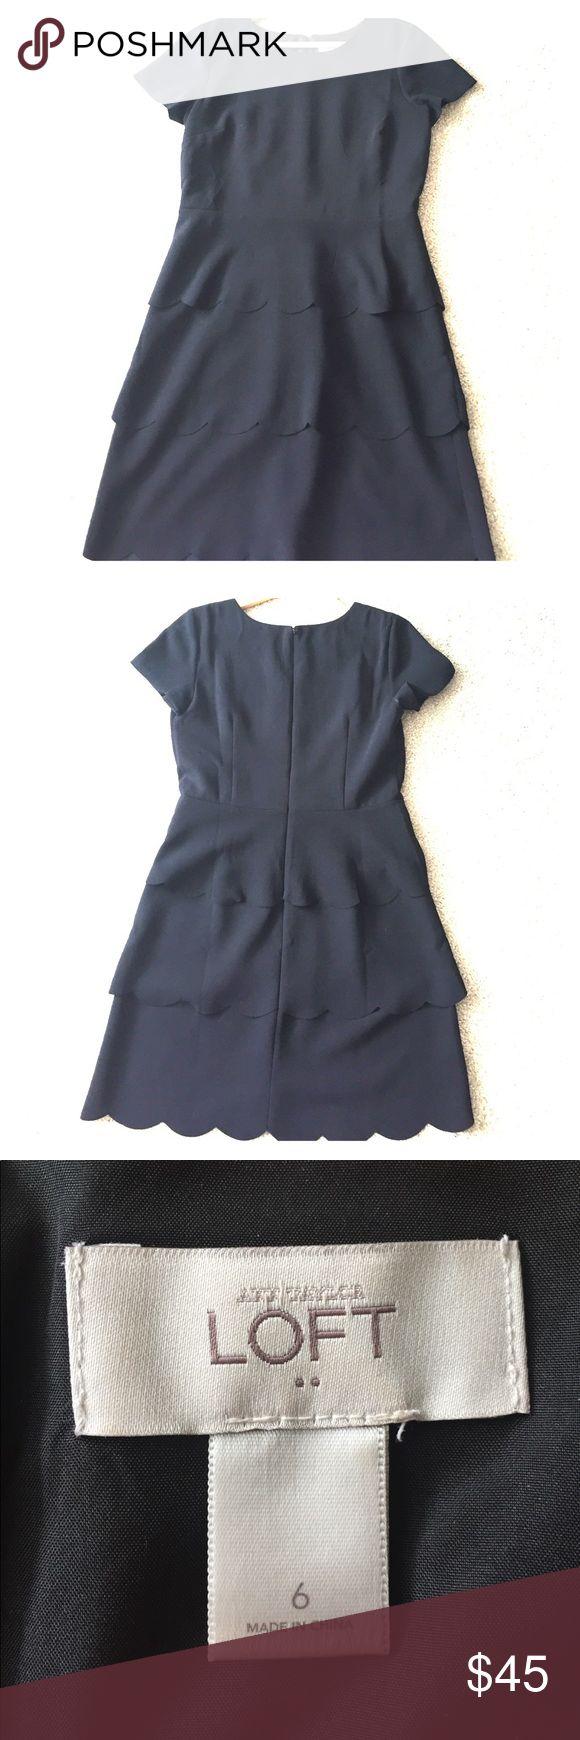 Beautiful scalloped Little black dress - Loft The perfect little black dress with a little scalloped flair. Hits right above the knee. LOFT Dresses Midi